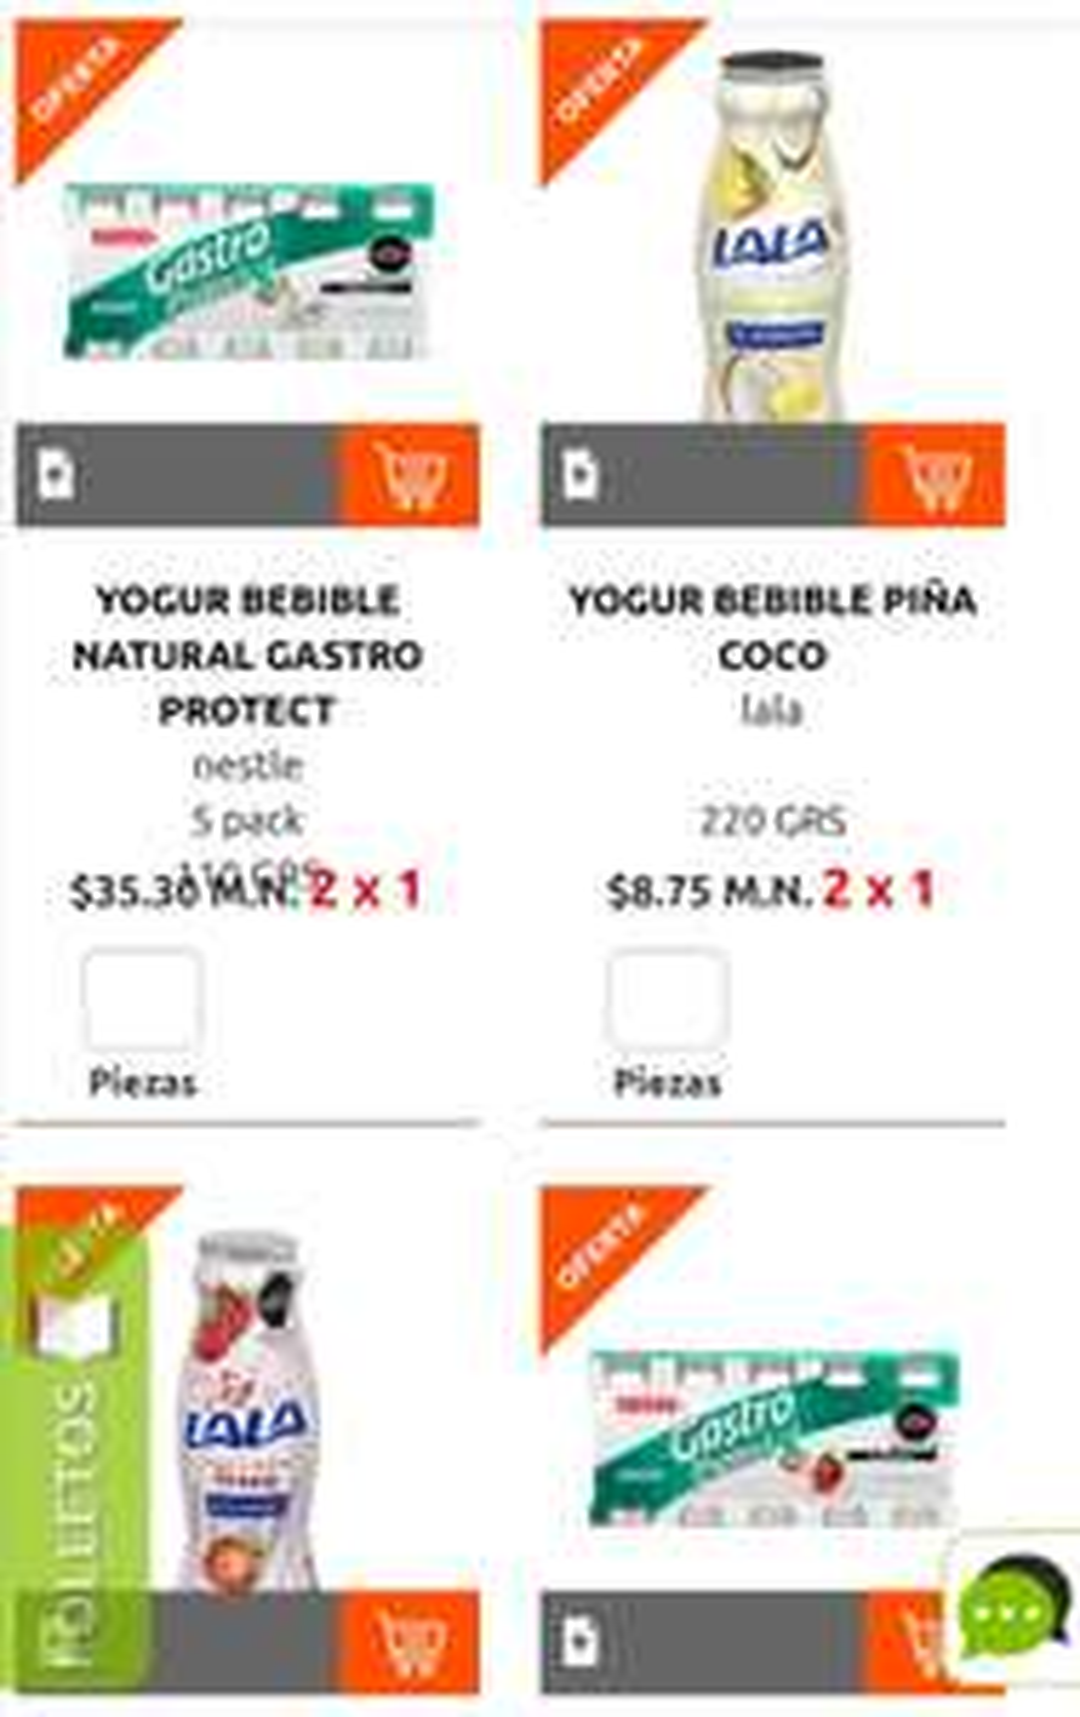 La Comer: 2 x 1 en yoghurt bebible Lala ó Nestlé